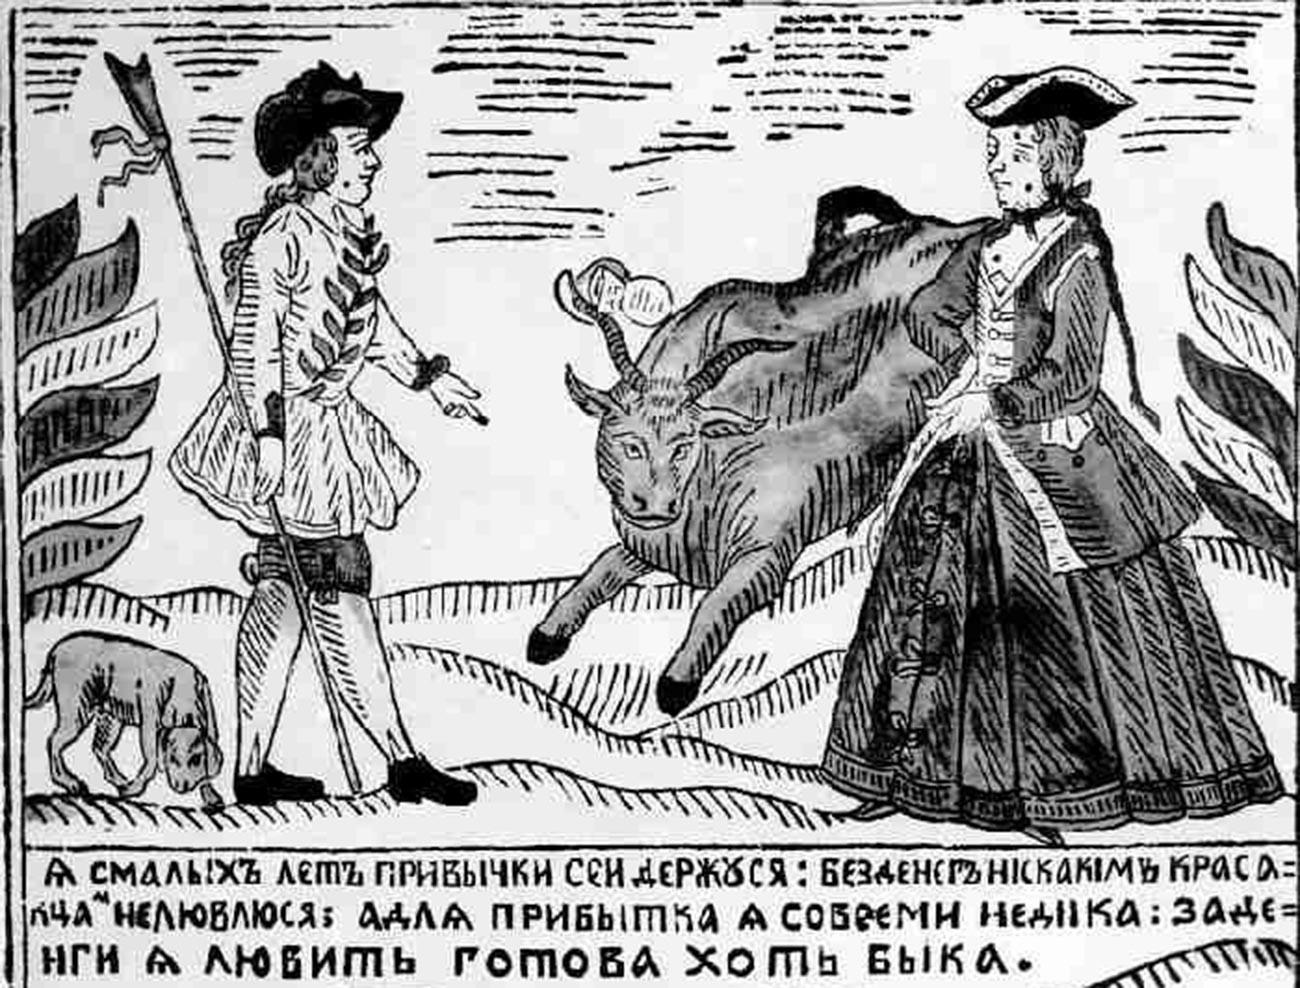 Loubok « Gandin et gandine vénale », XVIIIe siècle